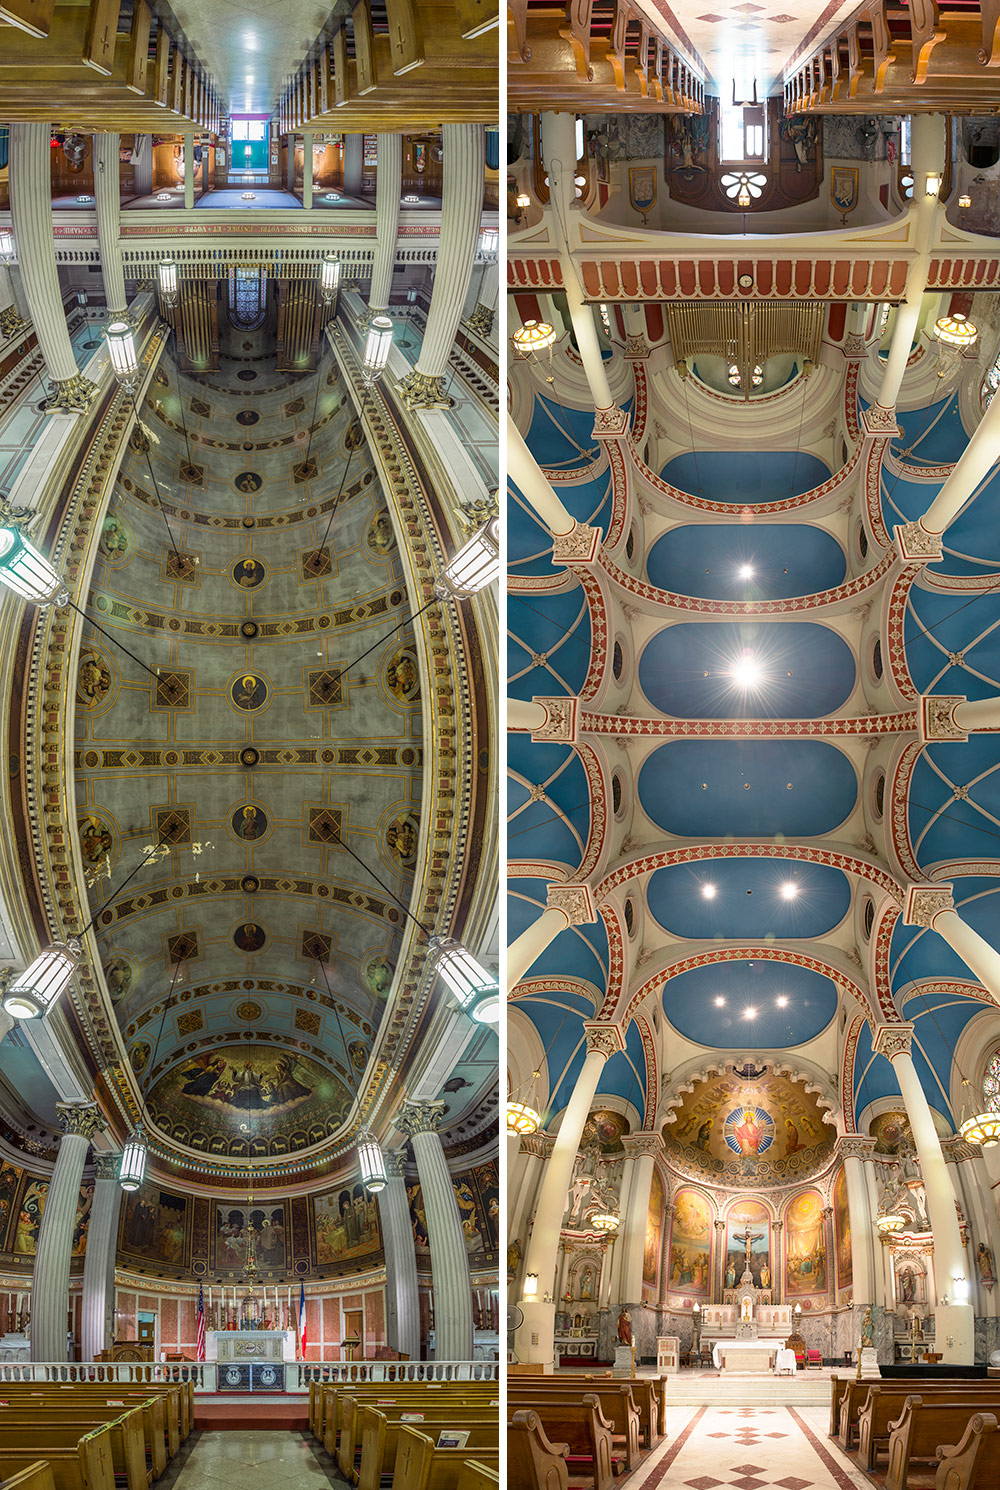 chiese-new-york-interno-foto-panoramiche-verticali-richard-silver-7